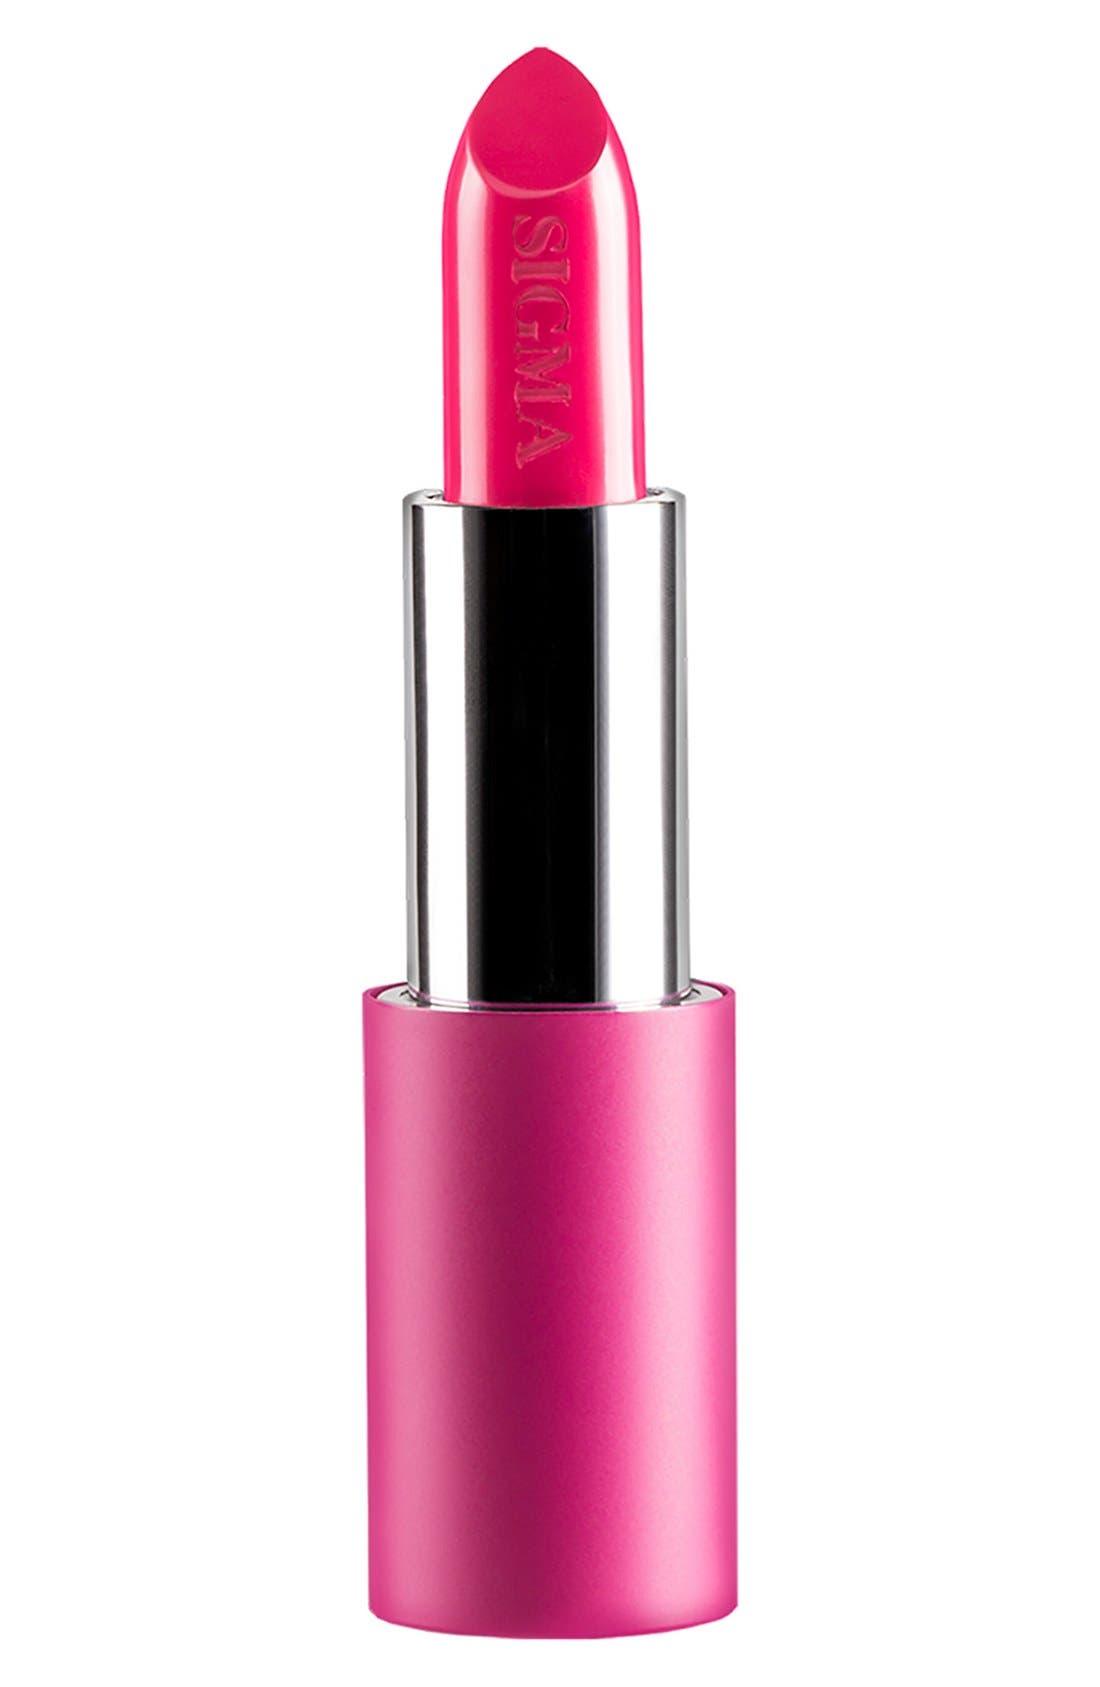 Sigma Beauty Pink - Power Stick Lipstick,                             Main thumbnail 1, color,                             SIGMA PINK